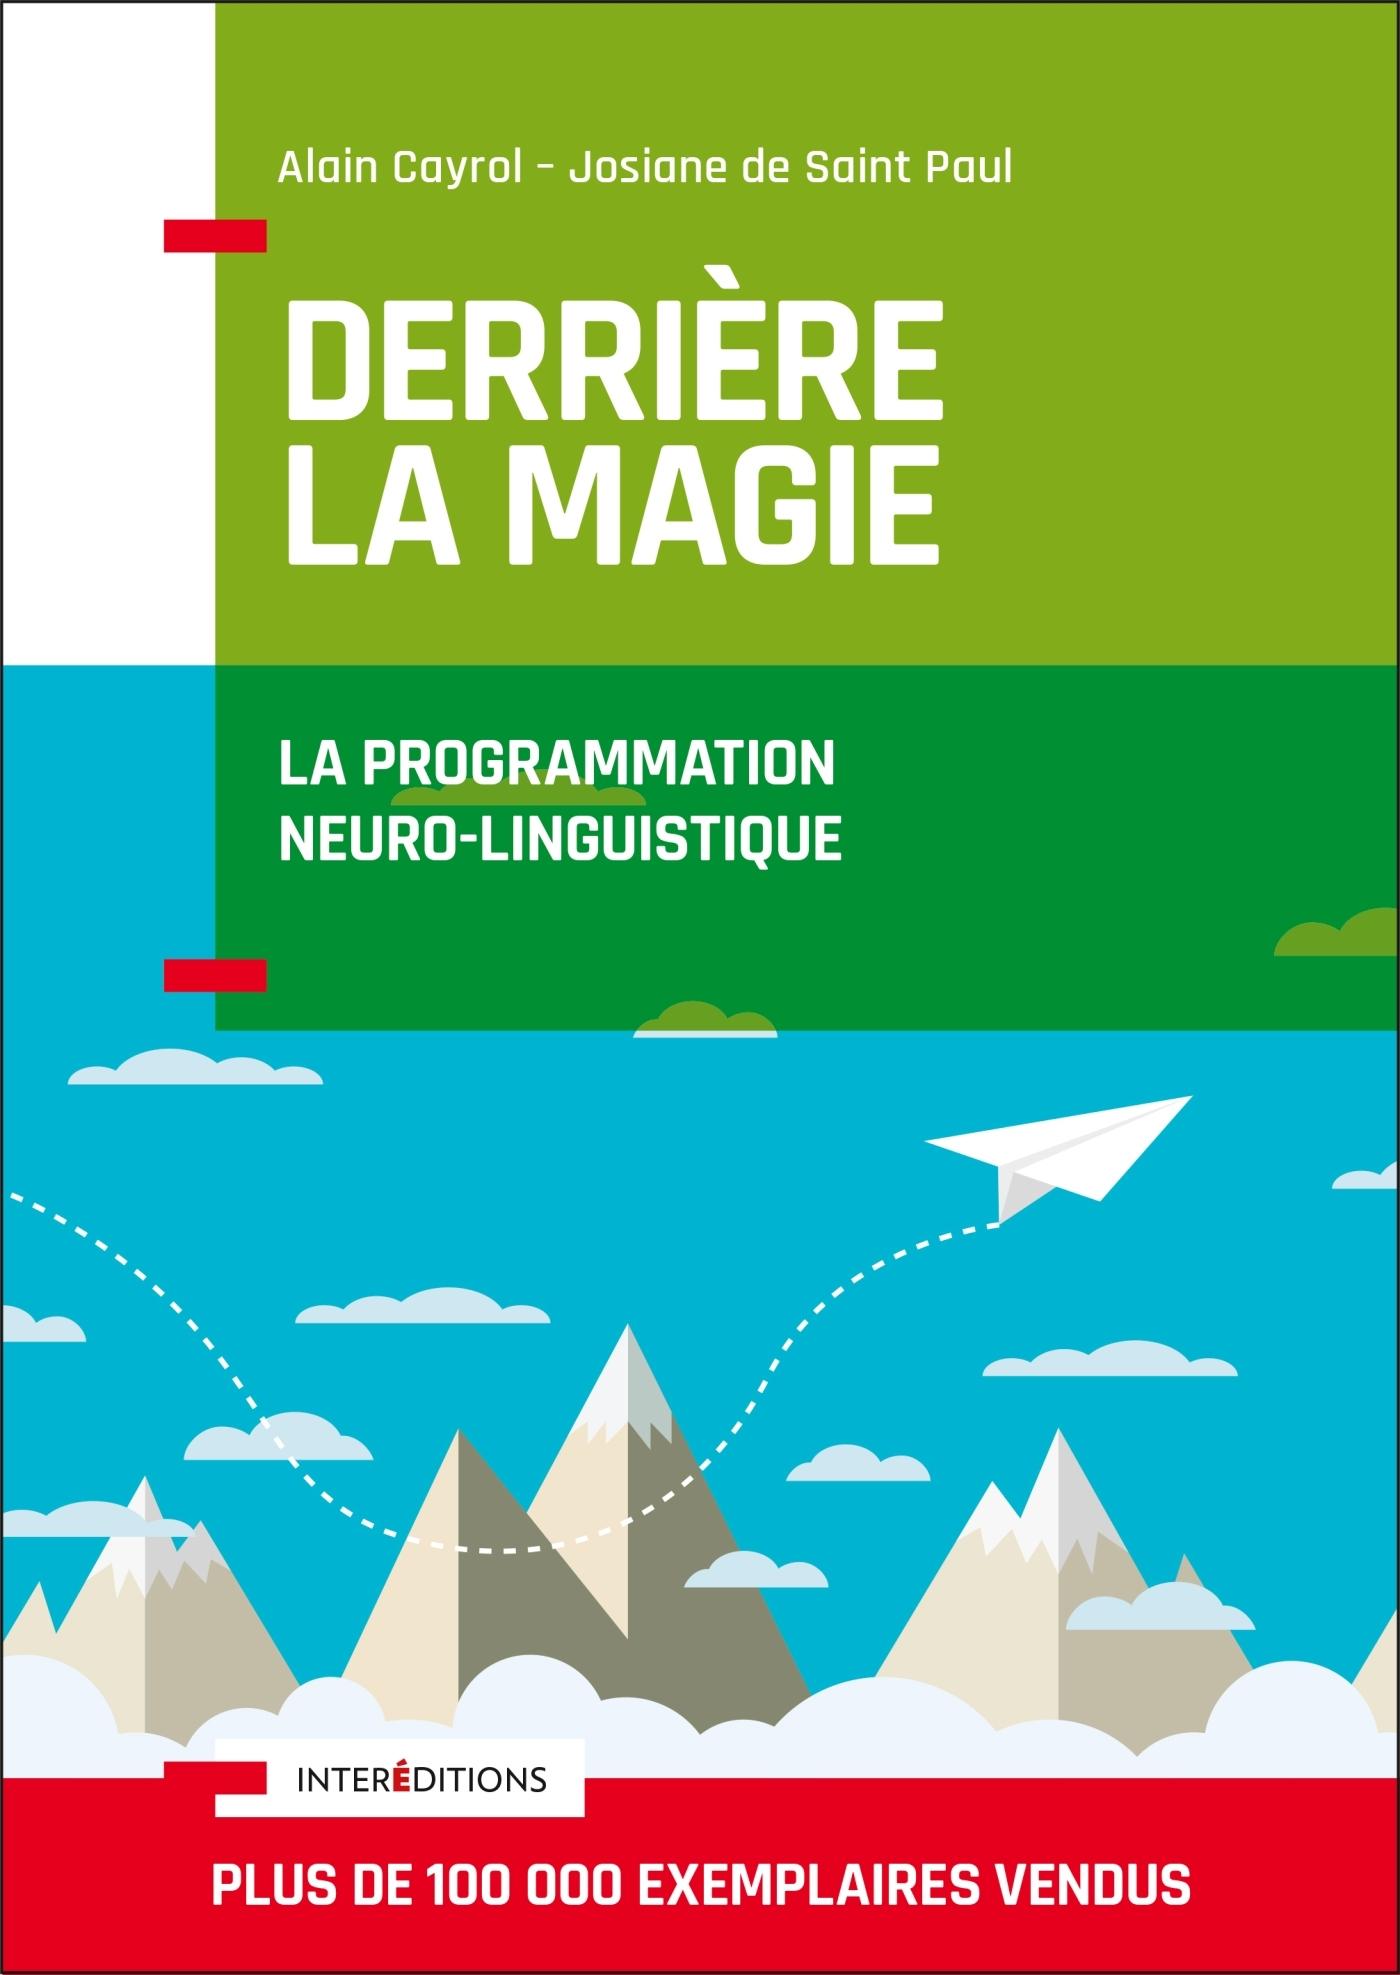 DERRIERE LA MAGIE - LA PROGRAMMATION NEURO-LINGUISTISQUE (PNL) - LA PROGRAMMATION NEURO-LINGUISTIQUE